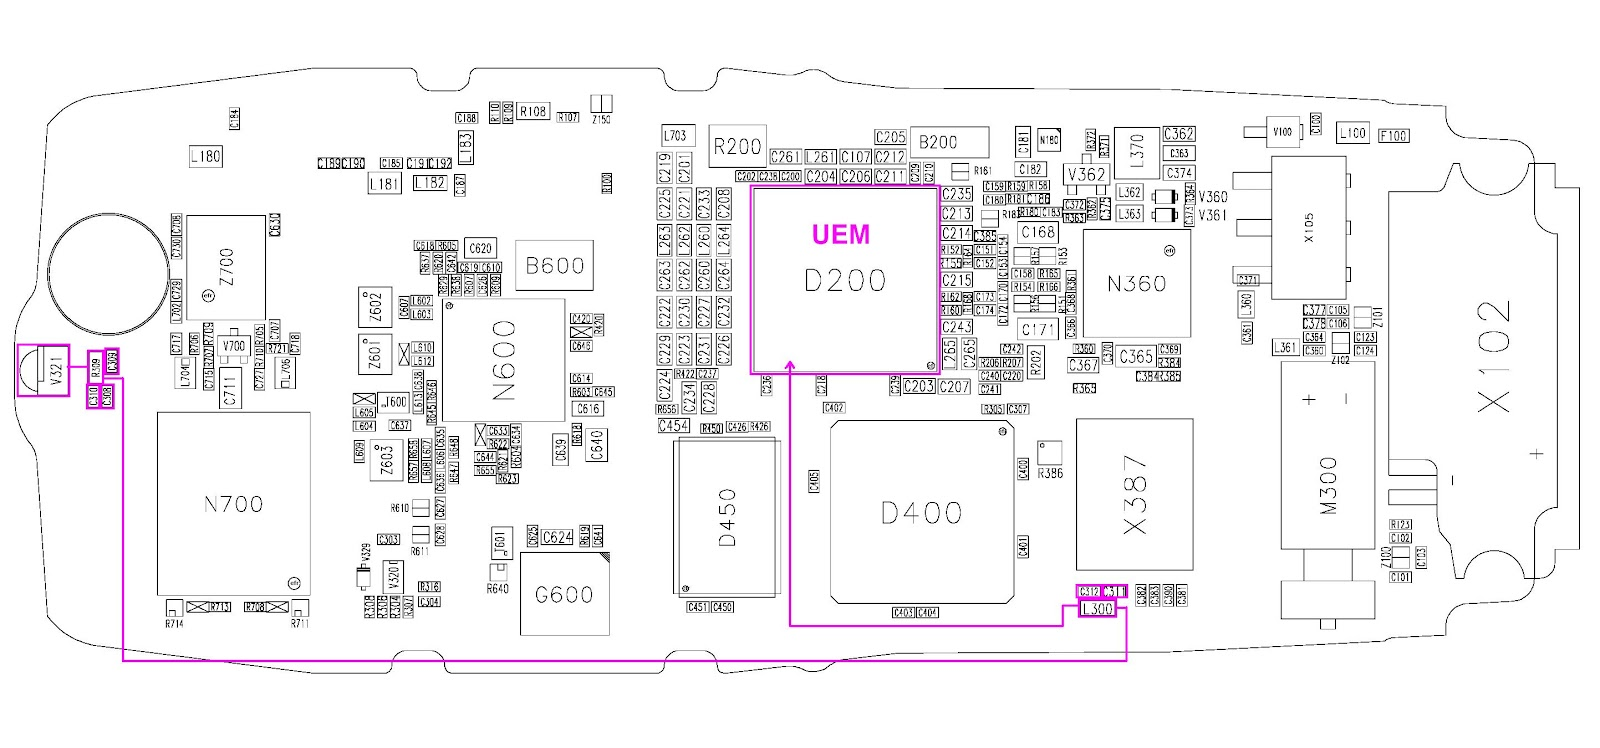 hight resolution of circuit diagram nokia 1100 wiring diagram mega circuit diagram nokia 1100